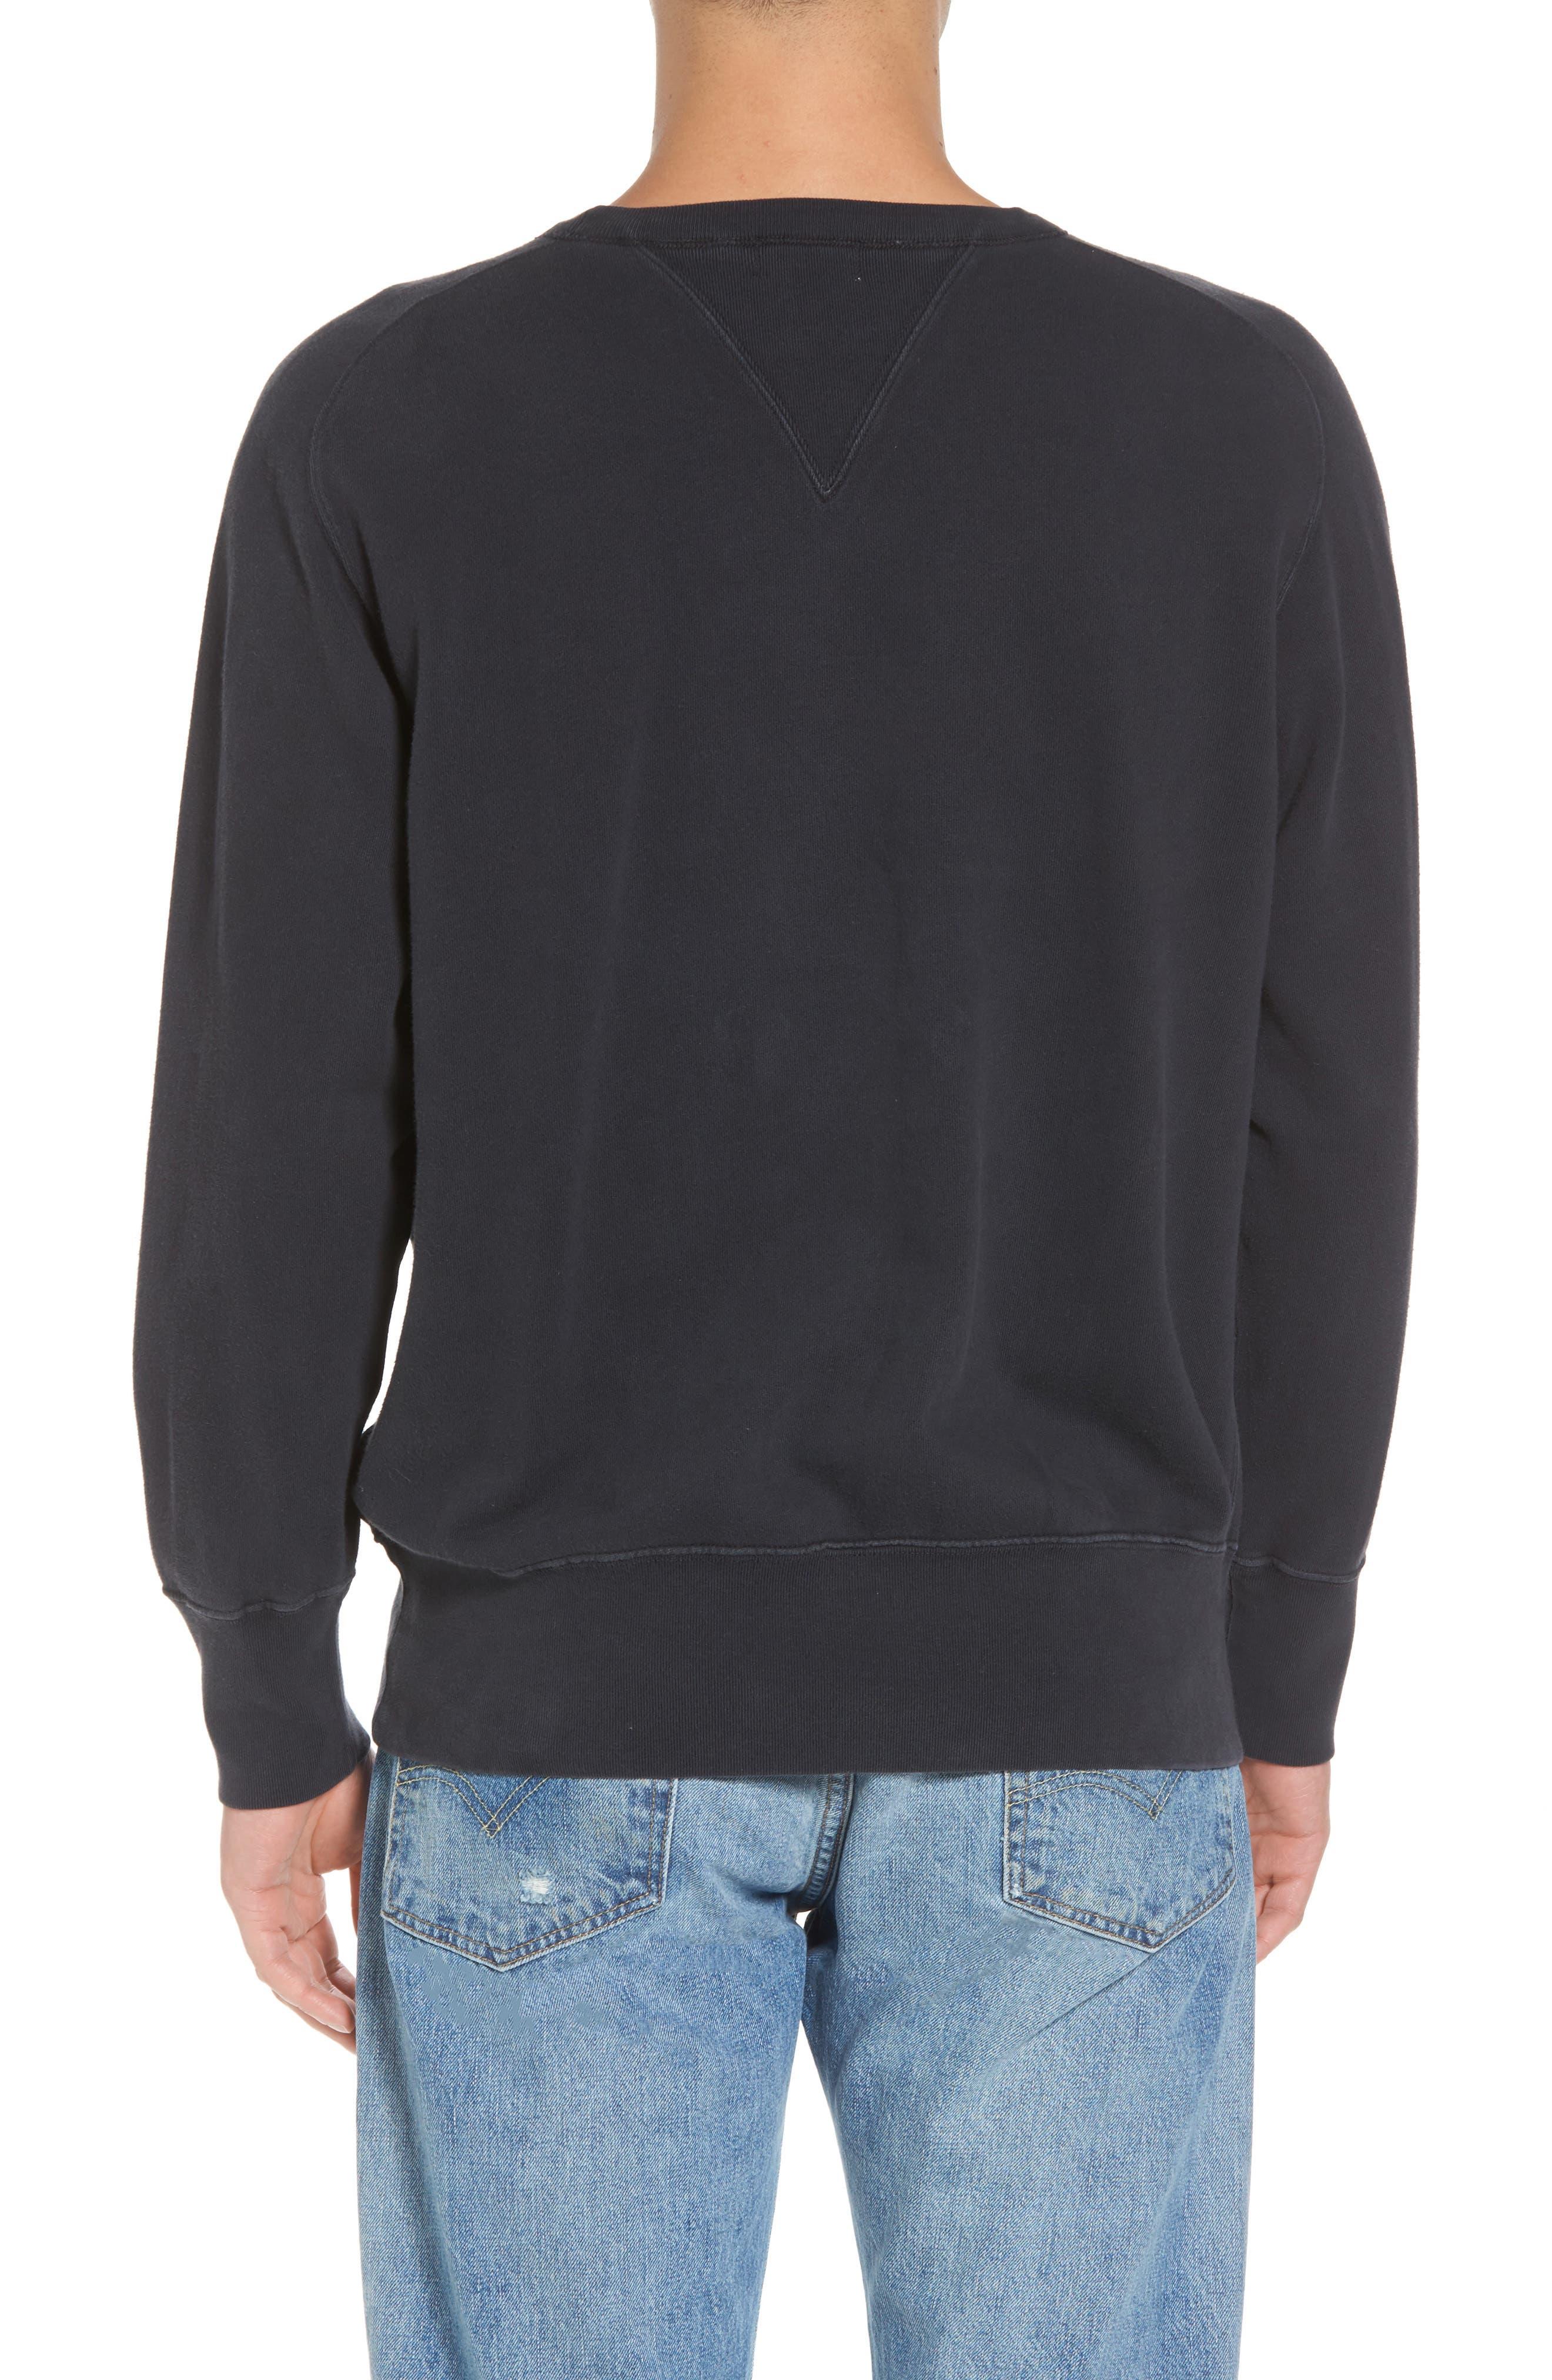 Bay Meadows Sweatshirt,                             Alternate thumbnail 2, color,                             BLACK